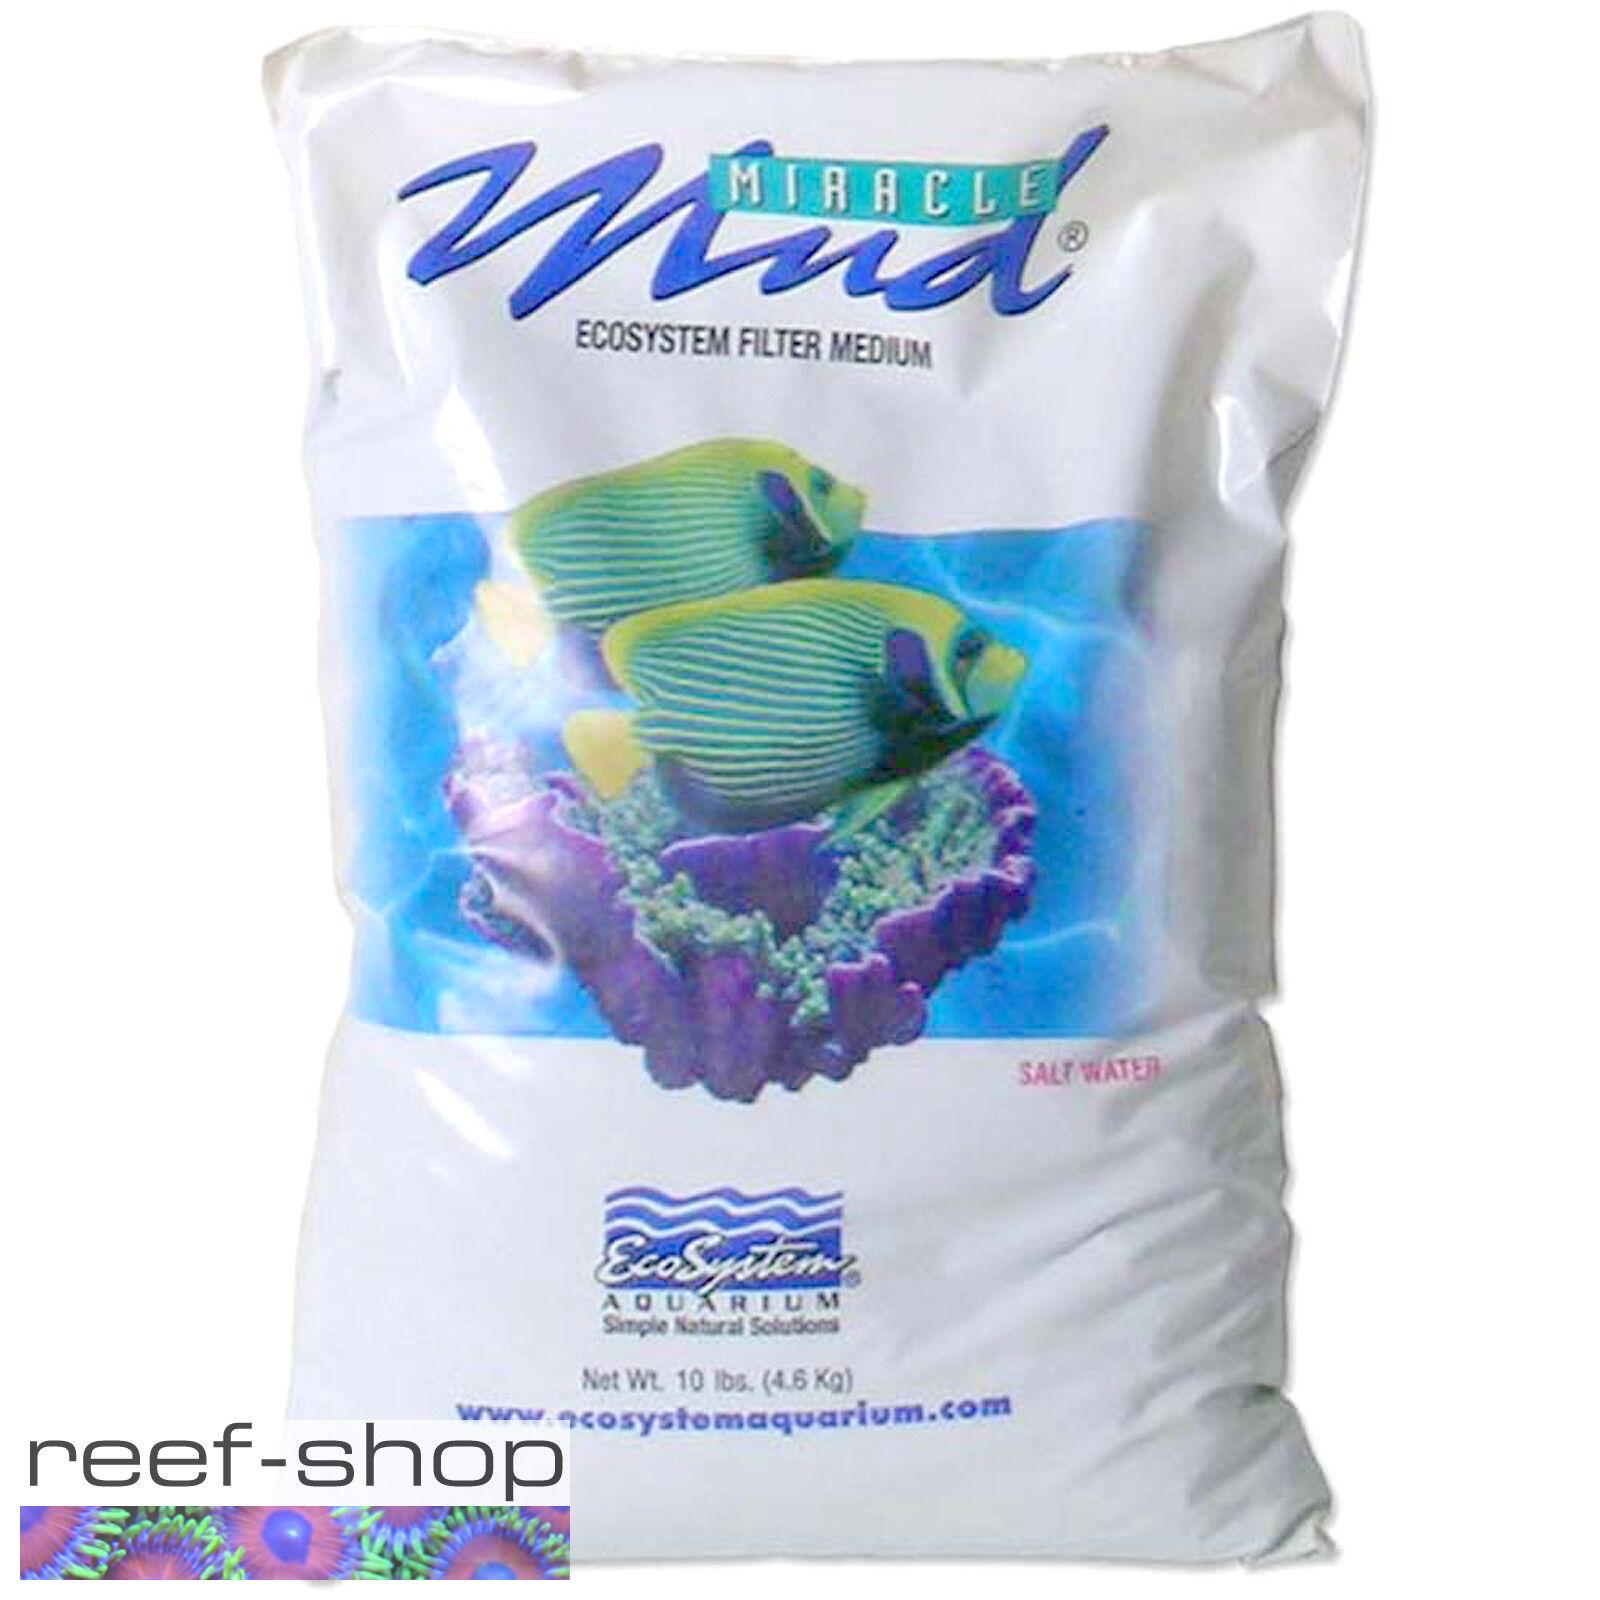 EcoSystem Miracle Mud 10 lb Bag Refugium Aquarium Substrate Free USA Shipping